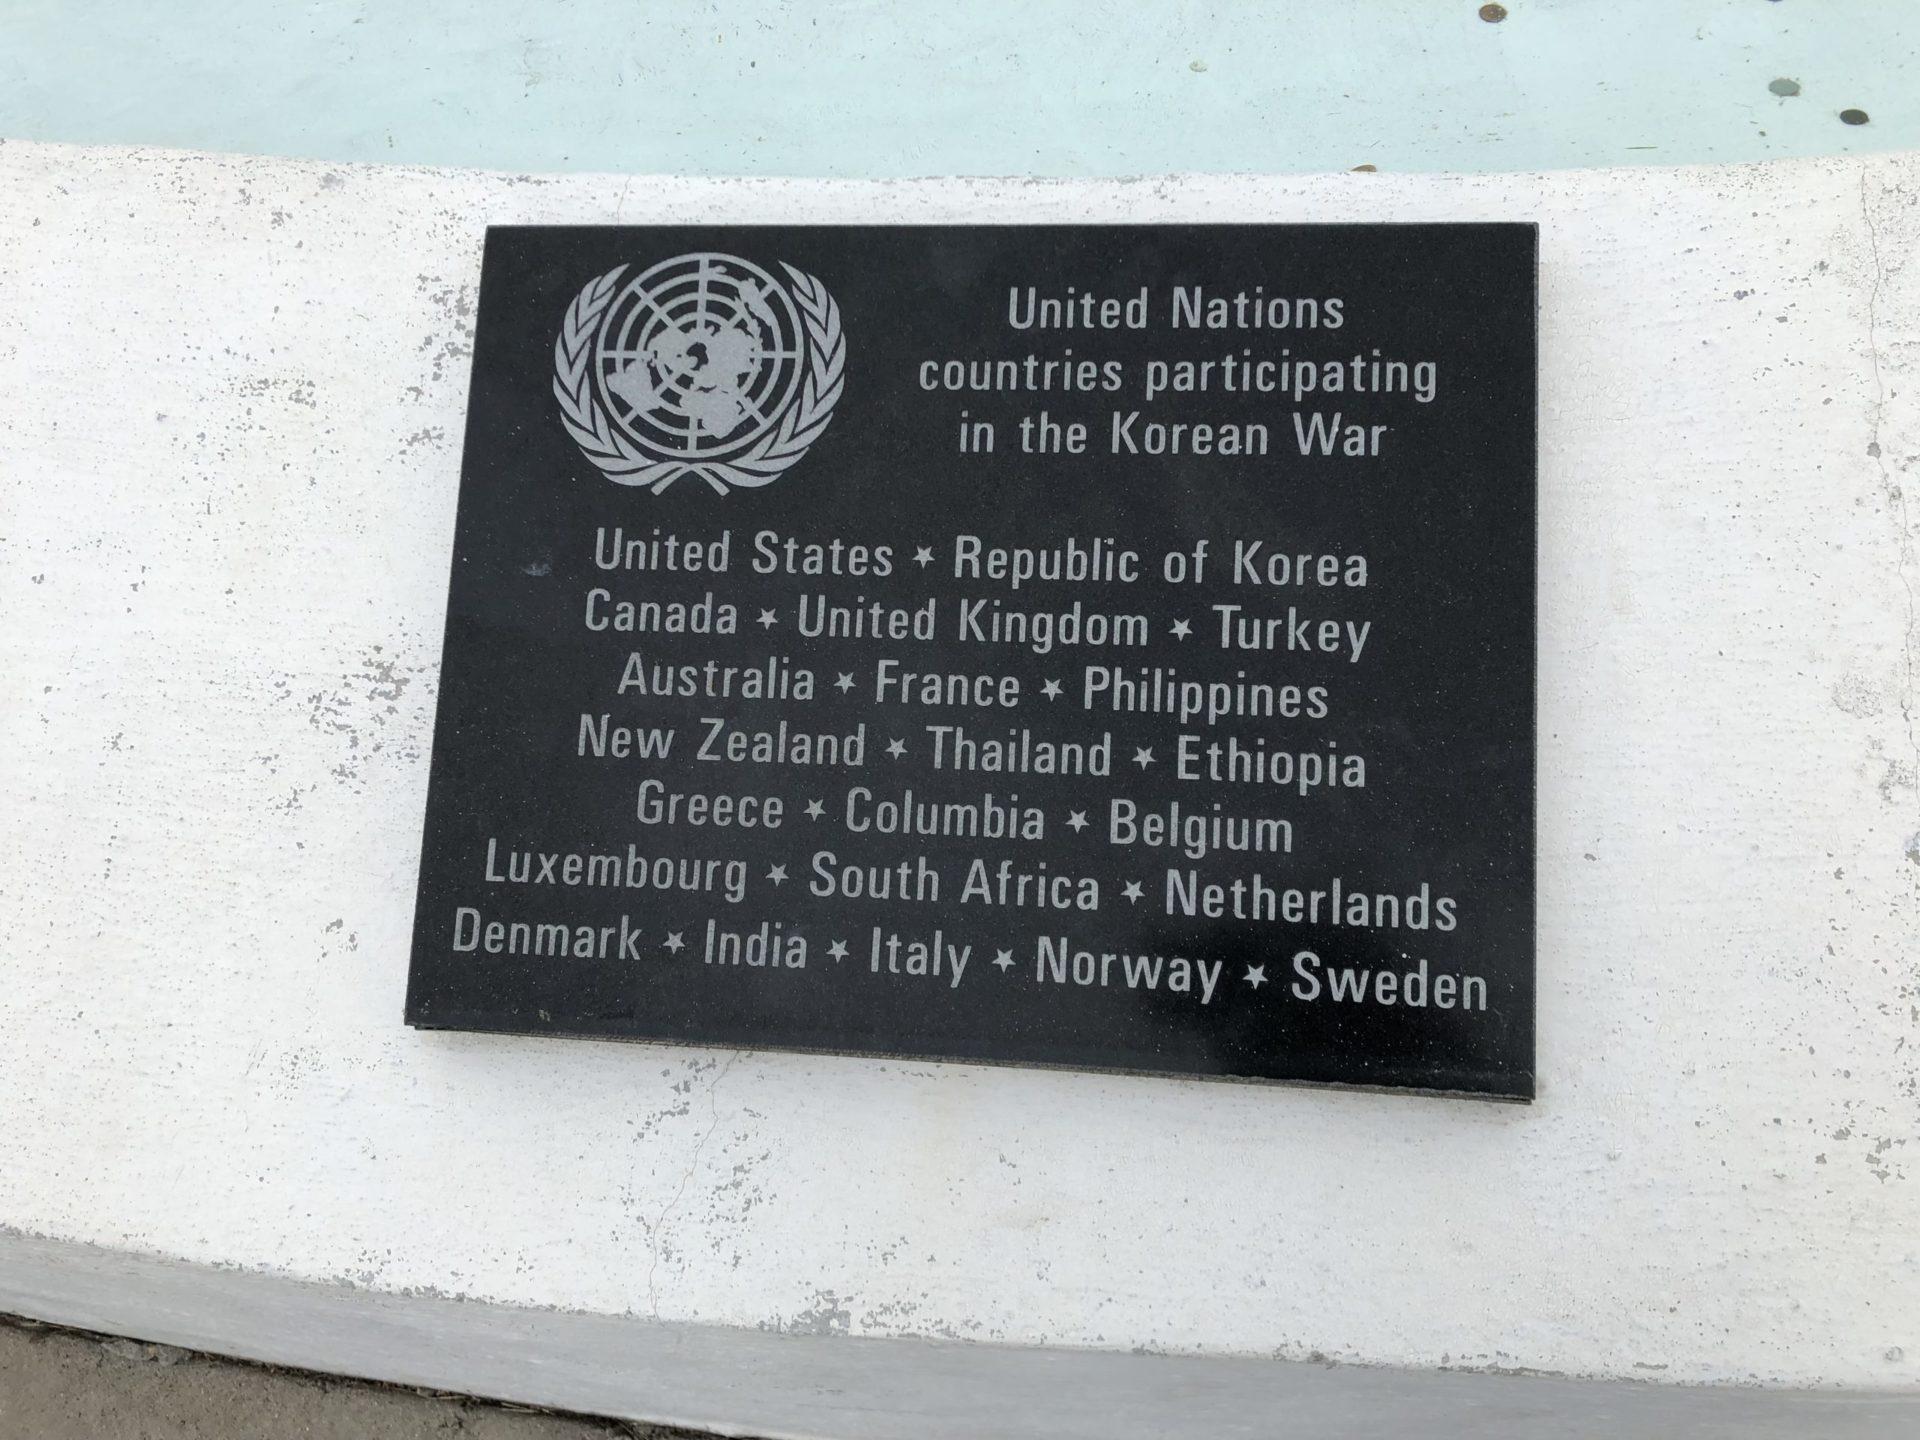 WI - United States